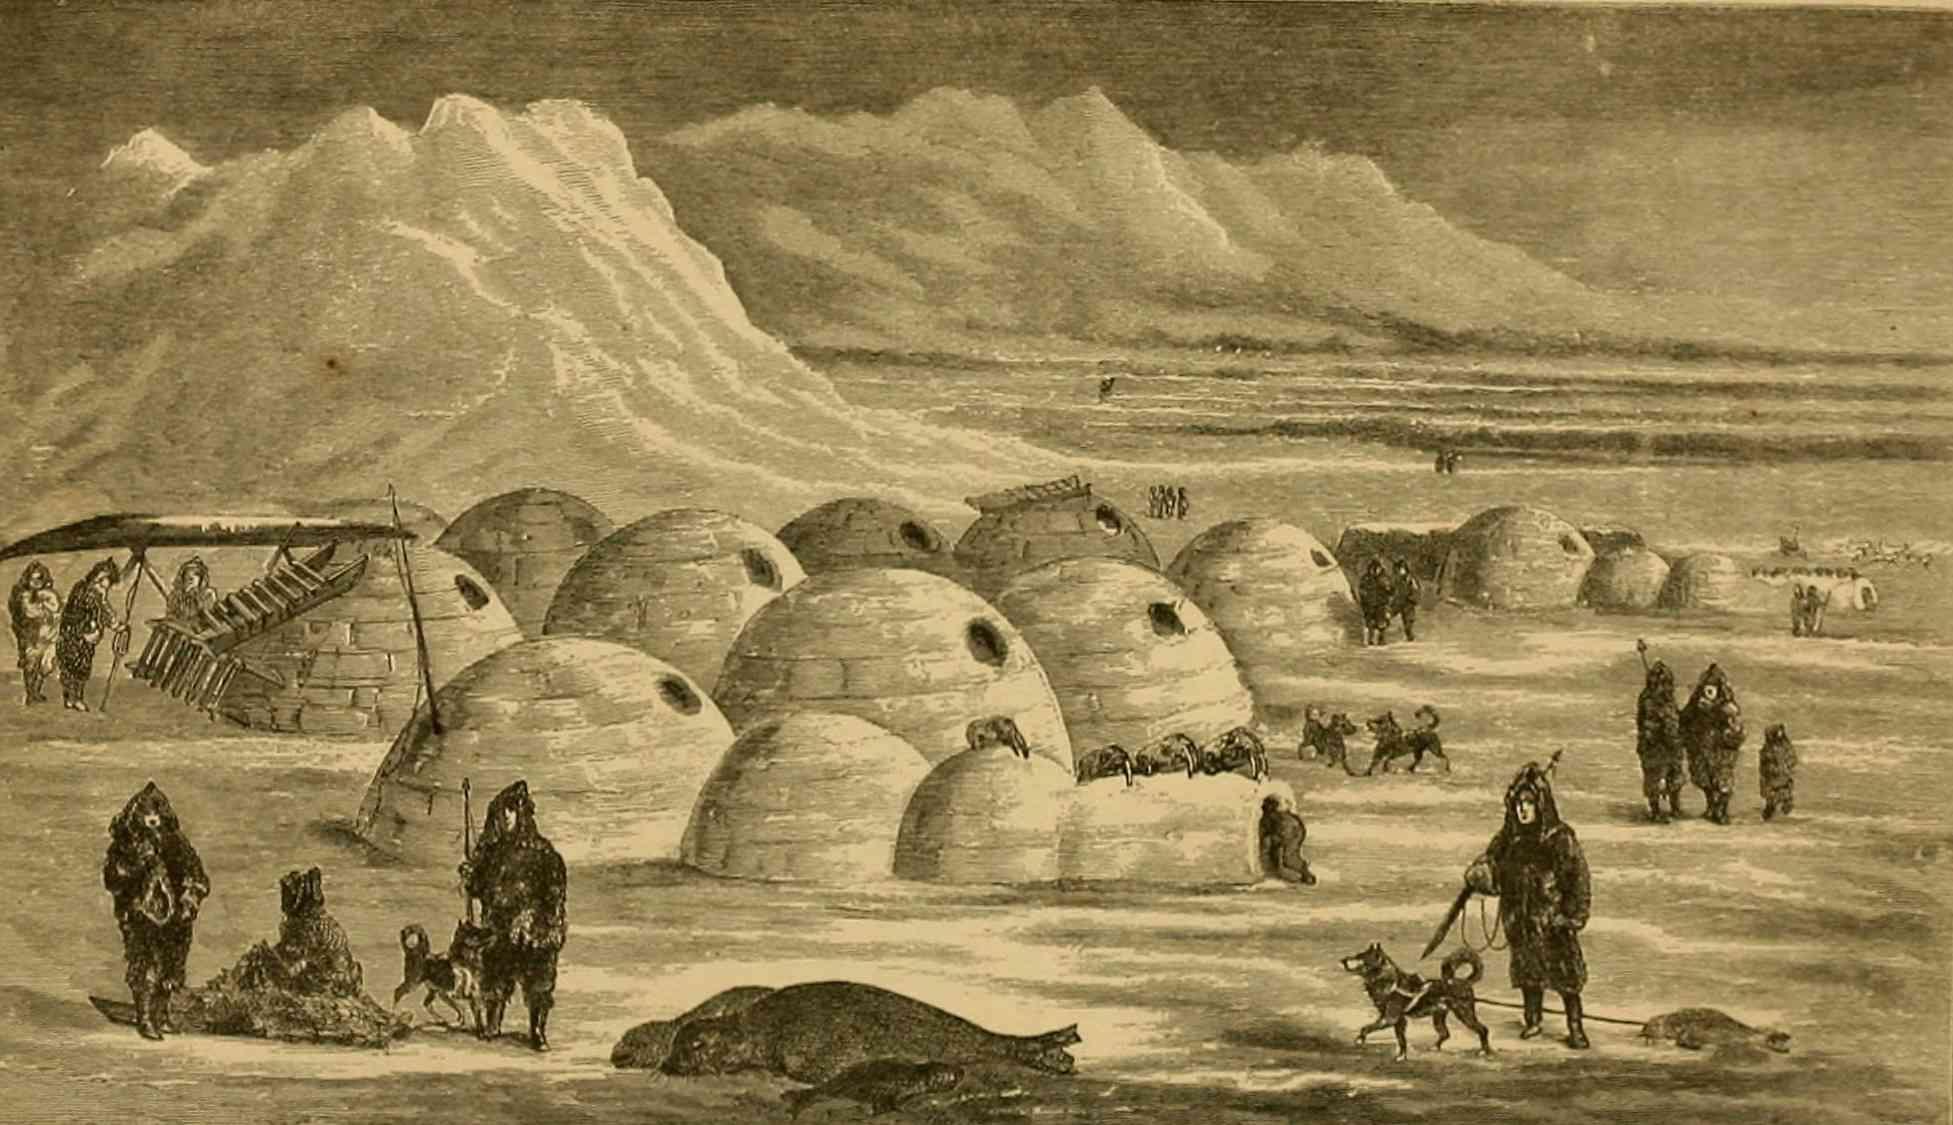 Twerpukjua Snow Village κοντά στο νησί Nunivak, Bering Sea